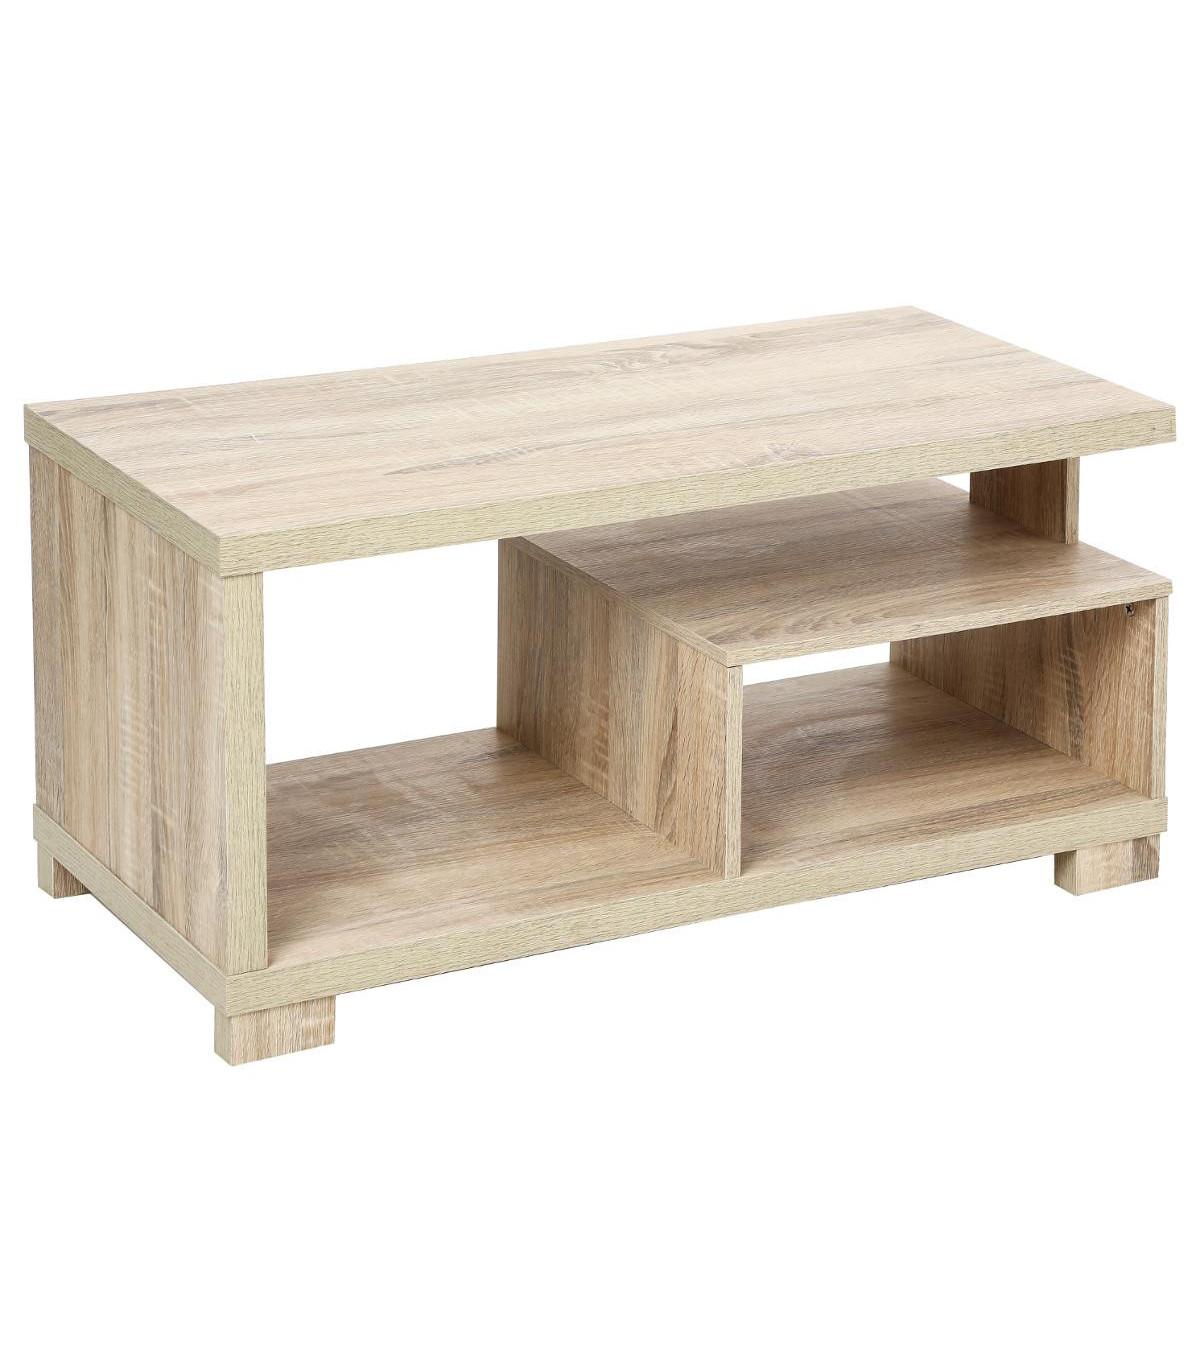 TABLE BASSE BIVOAK